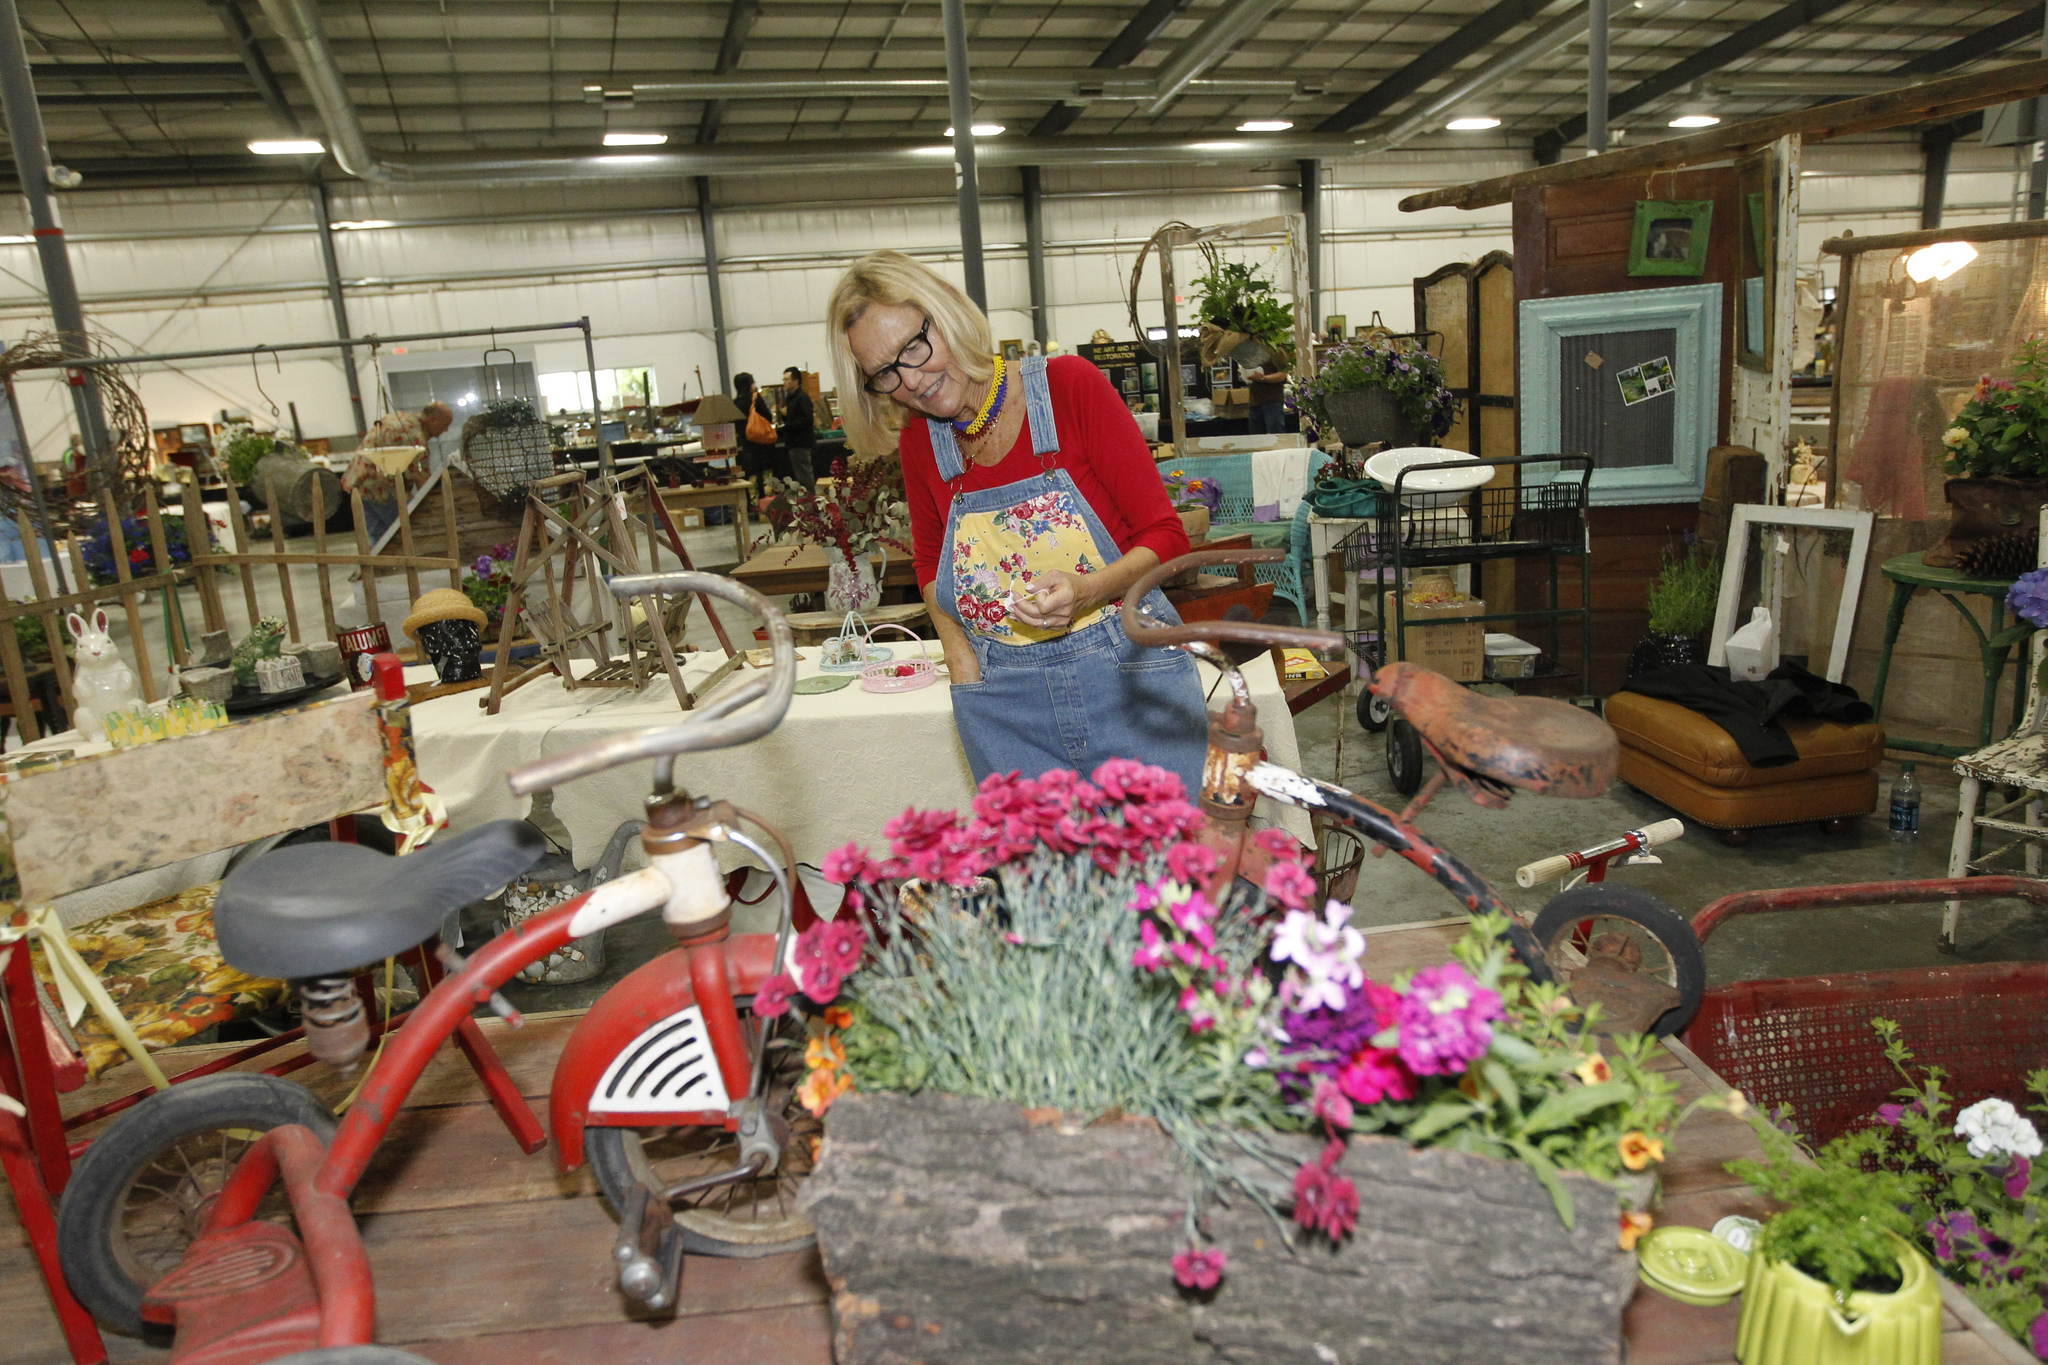 Grayslake illinois vintage flea market zurko promotions for Antique fairs and flea markets 2016